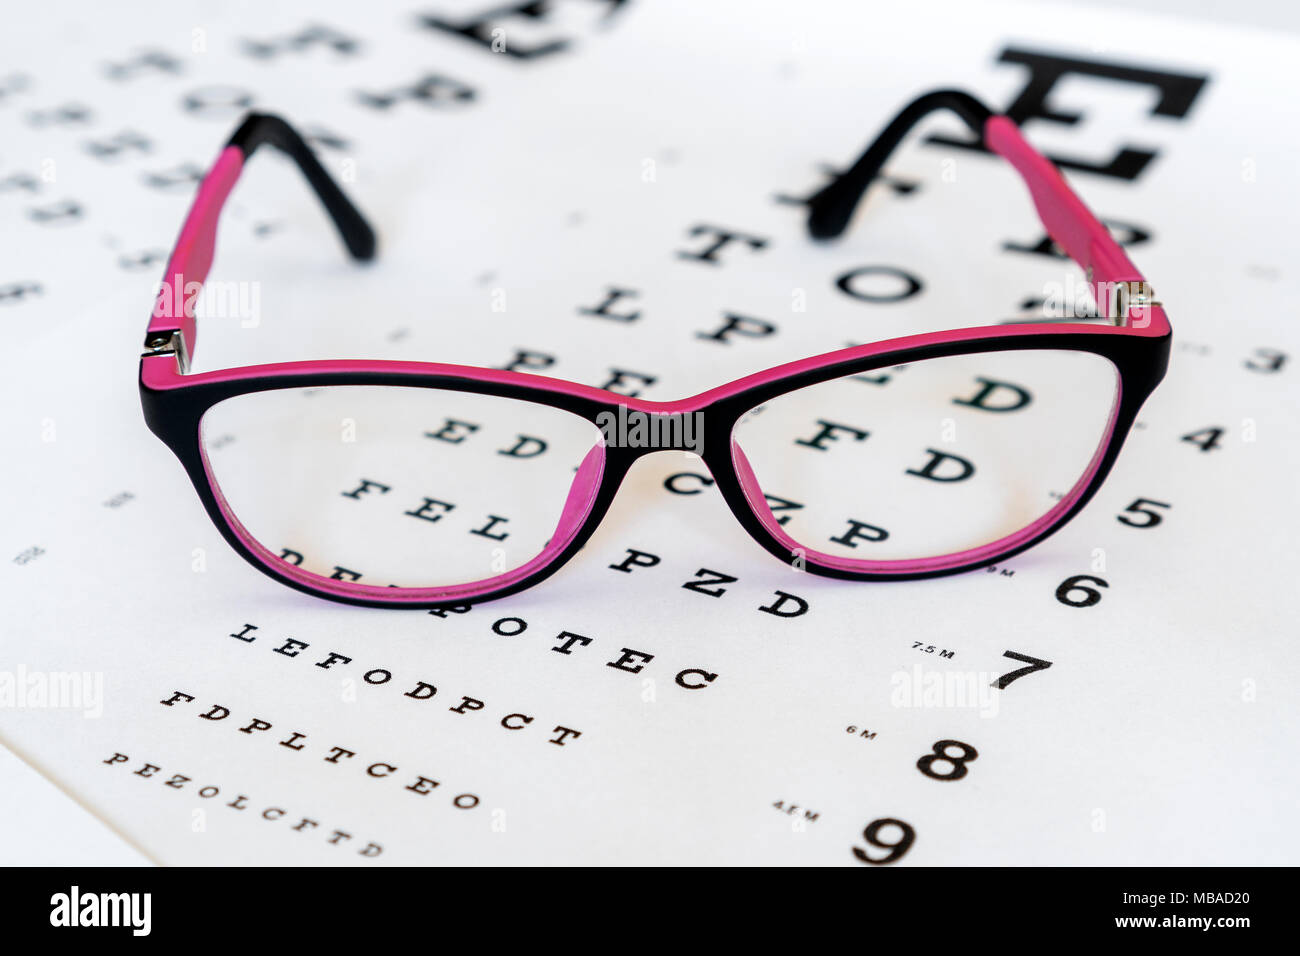 Glasses On A Eye Exam Chart To Test Eyesight Accuracy Stock Photo